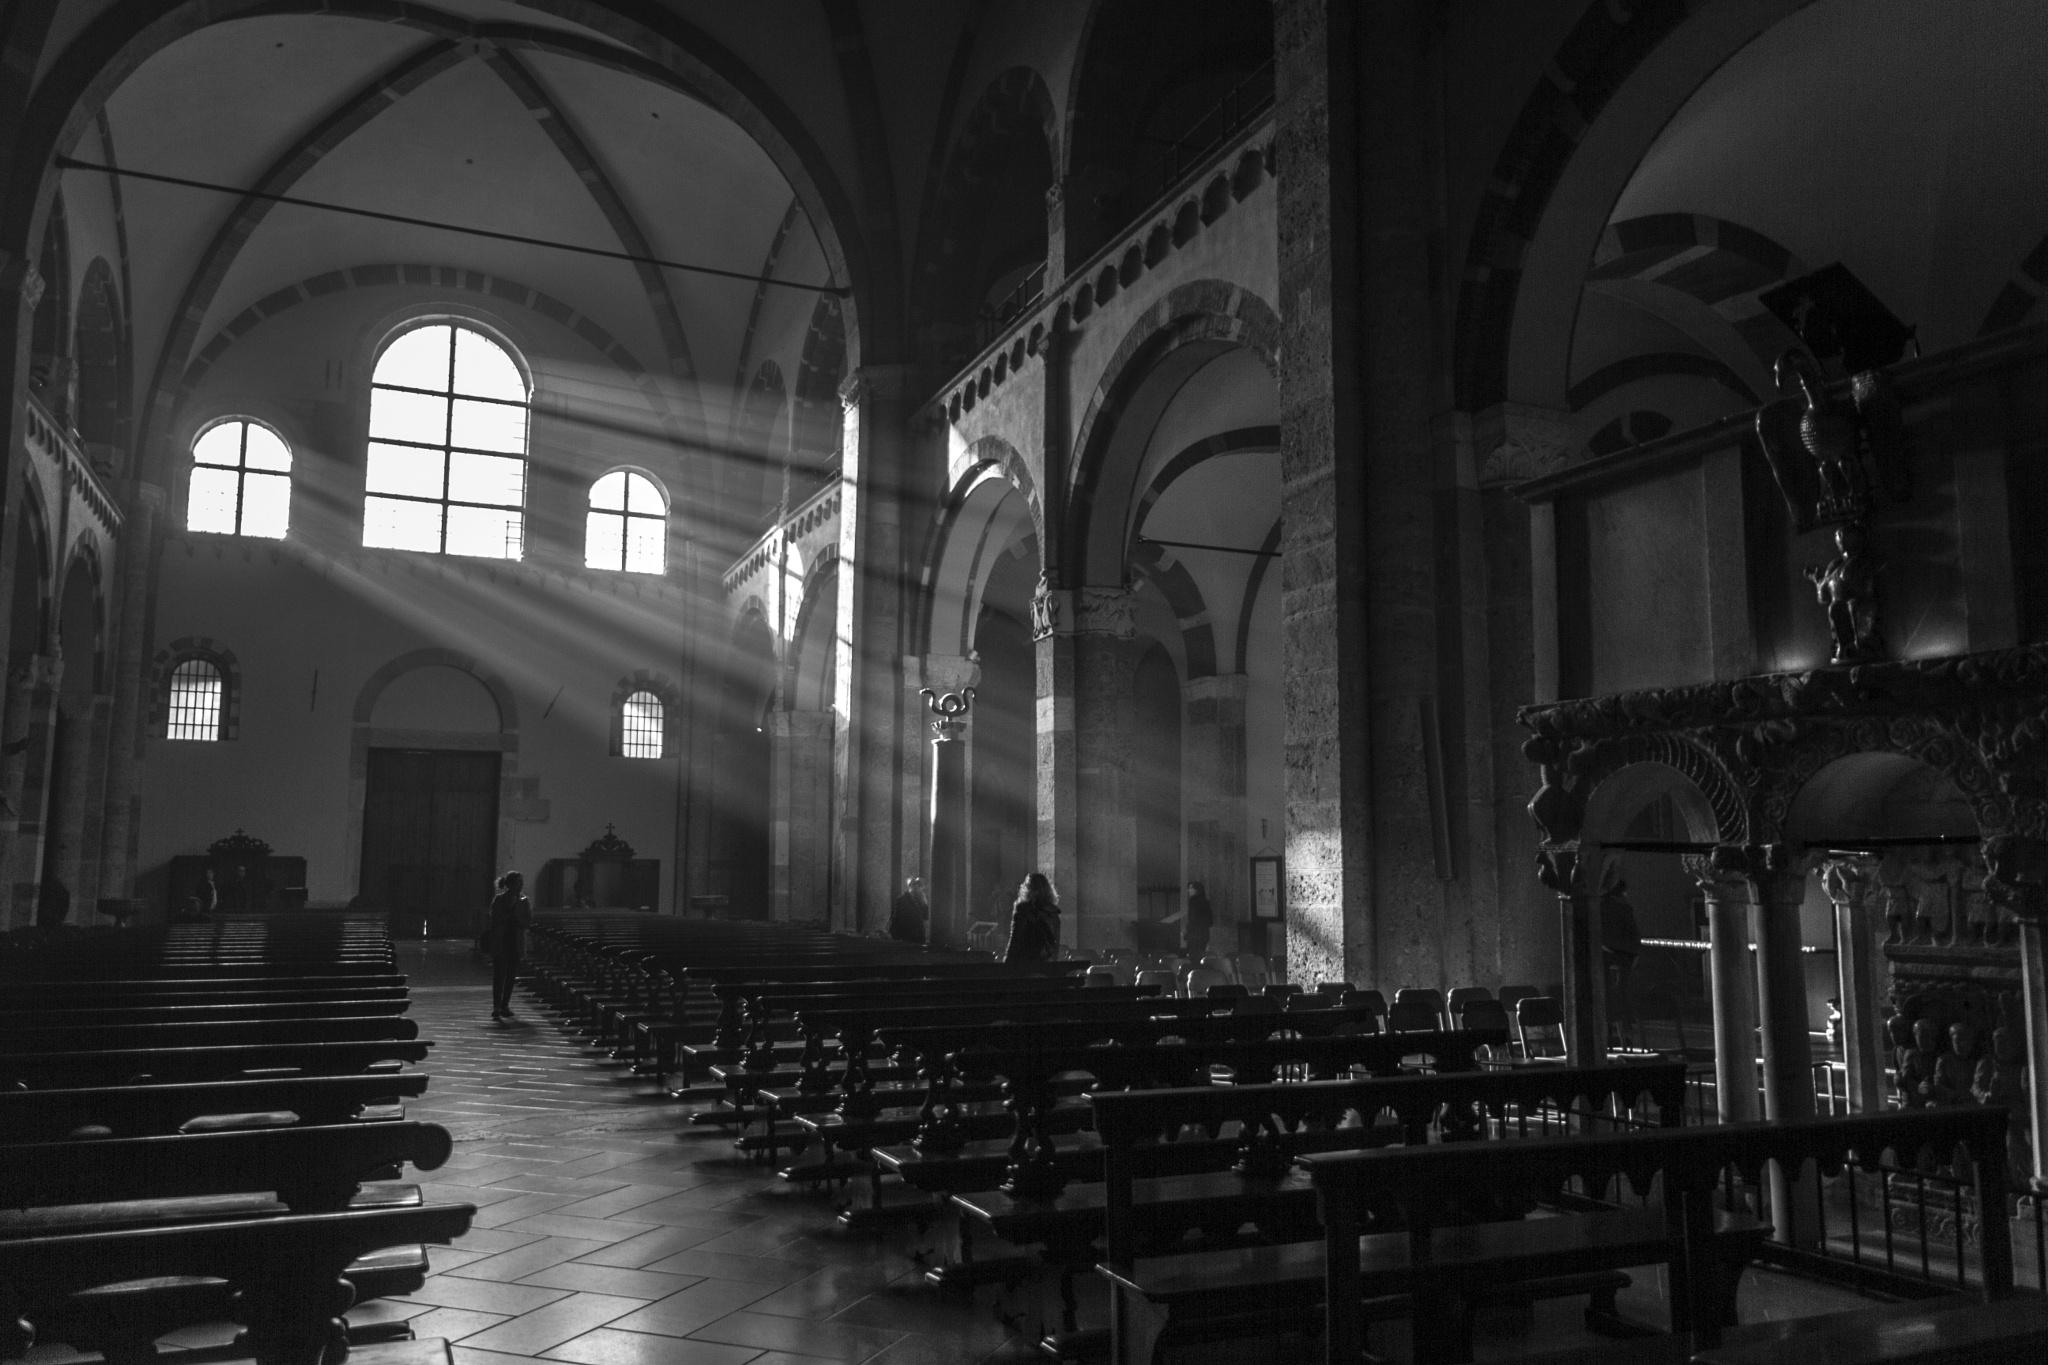 Milan, Basilica di Sant'Ambrogio - 6563 by Storvandre Photography